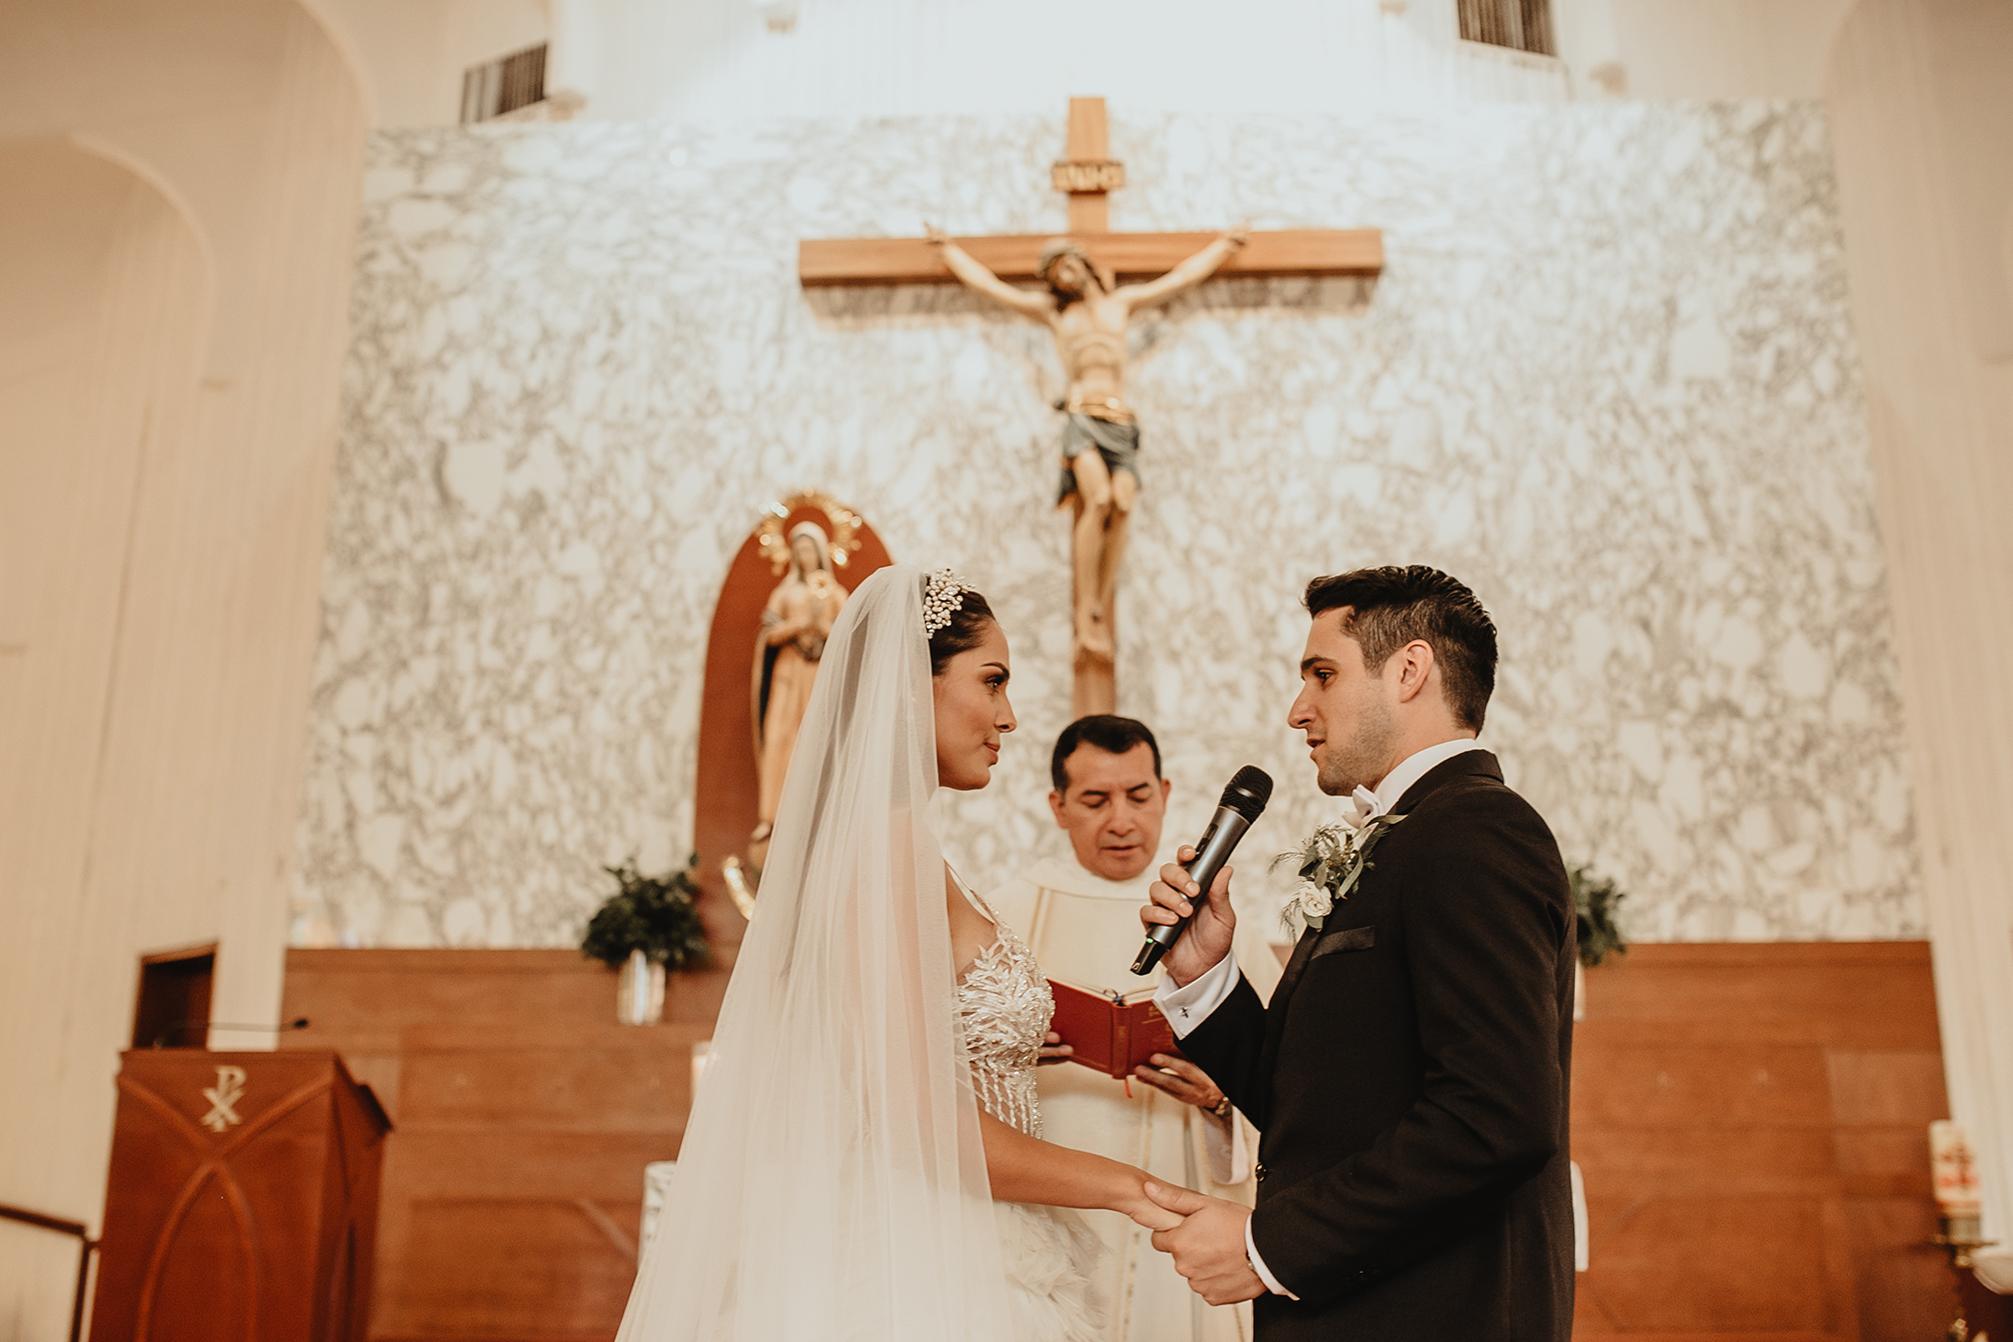 0625R&F__WeddingDestination_Weddingmerida_BodaMexico_FotografoDeBodas_FabrizioSimoneenFotografo.jpg